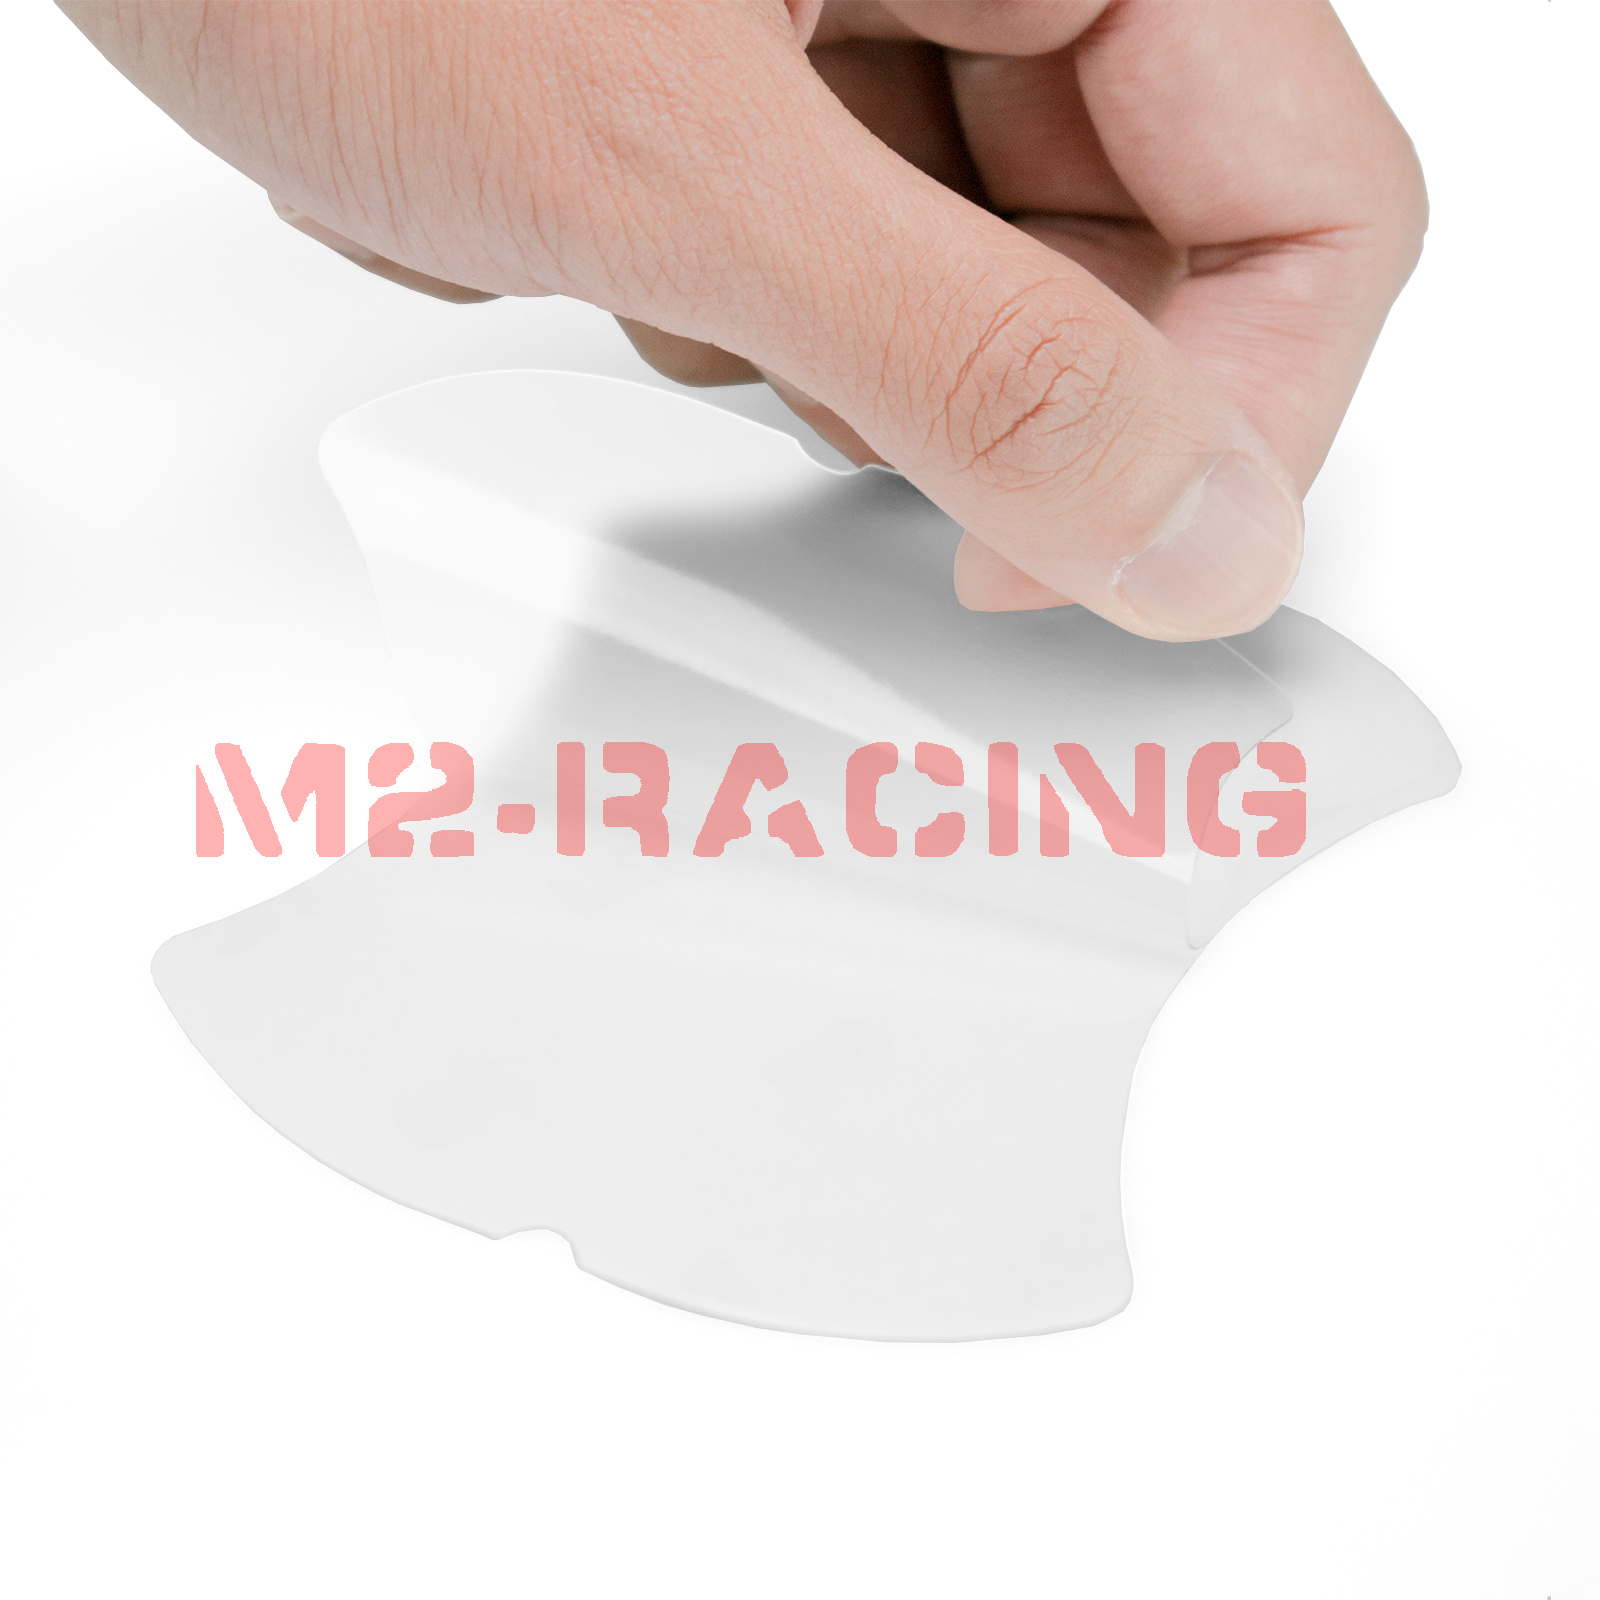 2x 3M Scotchguard Clear Paint Scratch Protector Door Handle Cup Film Bra #2